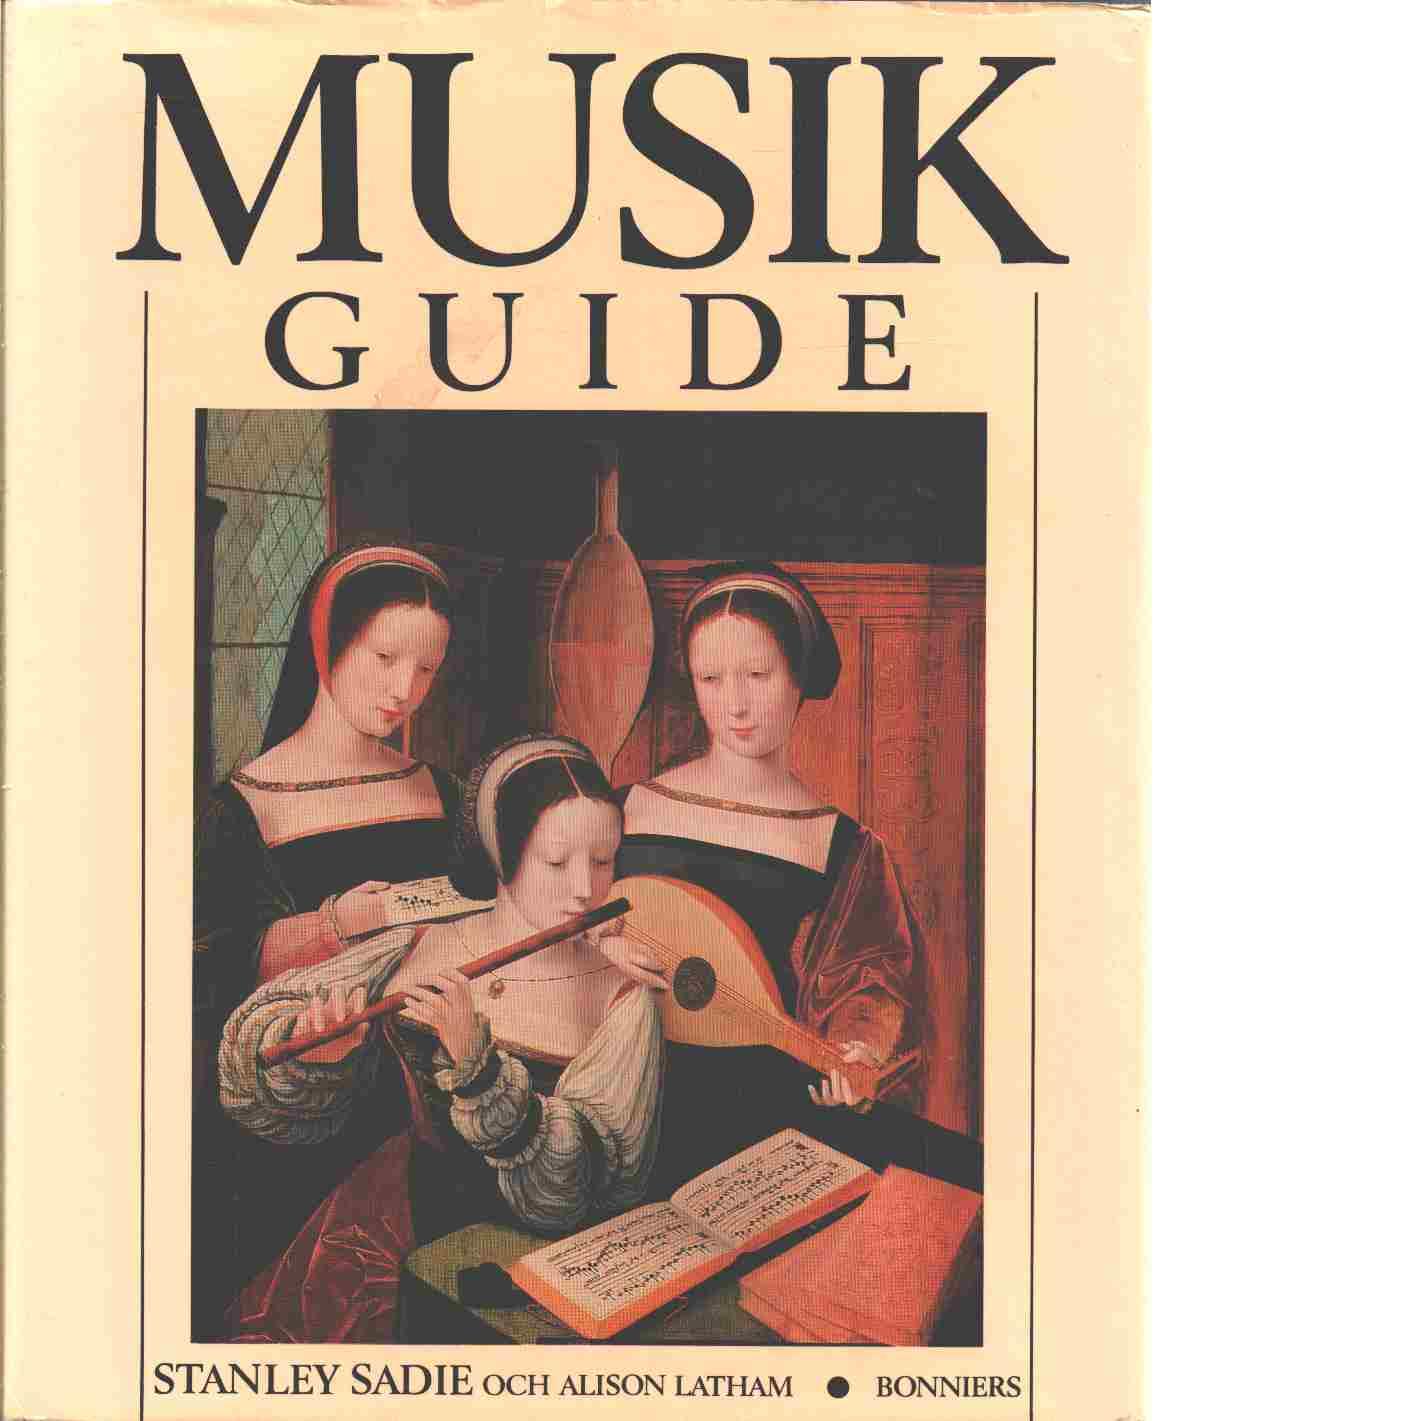 Musikguide [Musiktryck] - Sadie, Stanley och Latham, Alison